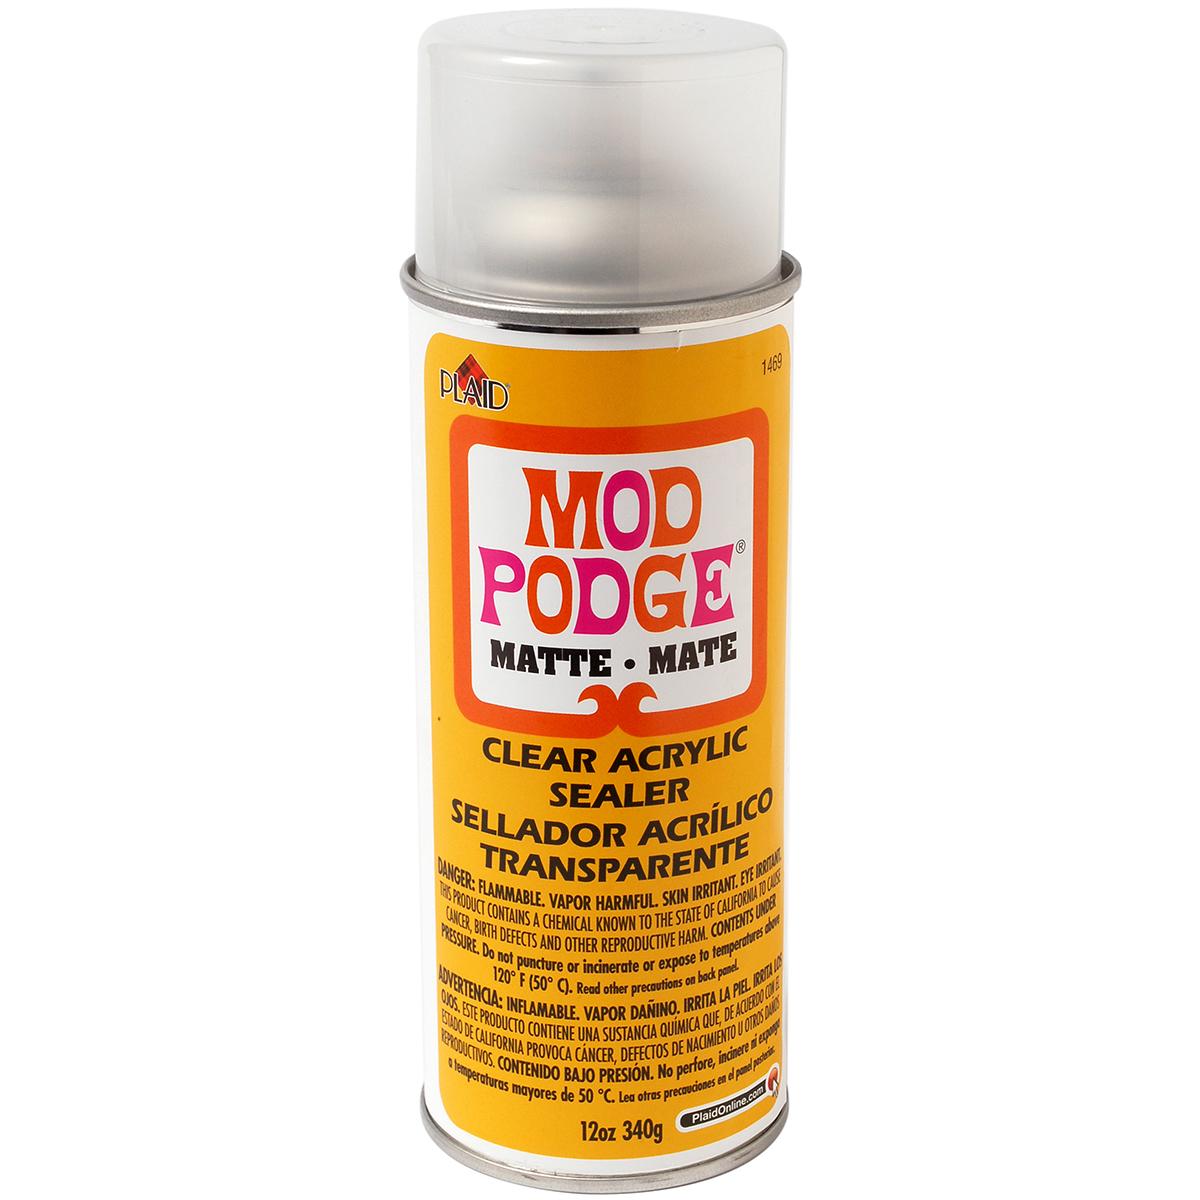 12-oz Plaid Mod Podge Clear Acrylic Sealer (matte) $6.88 + Free Store Pickup at Walmart or FS w/ Prime